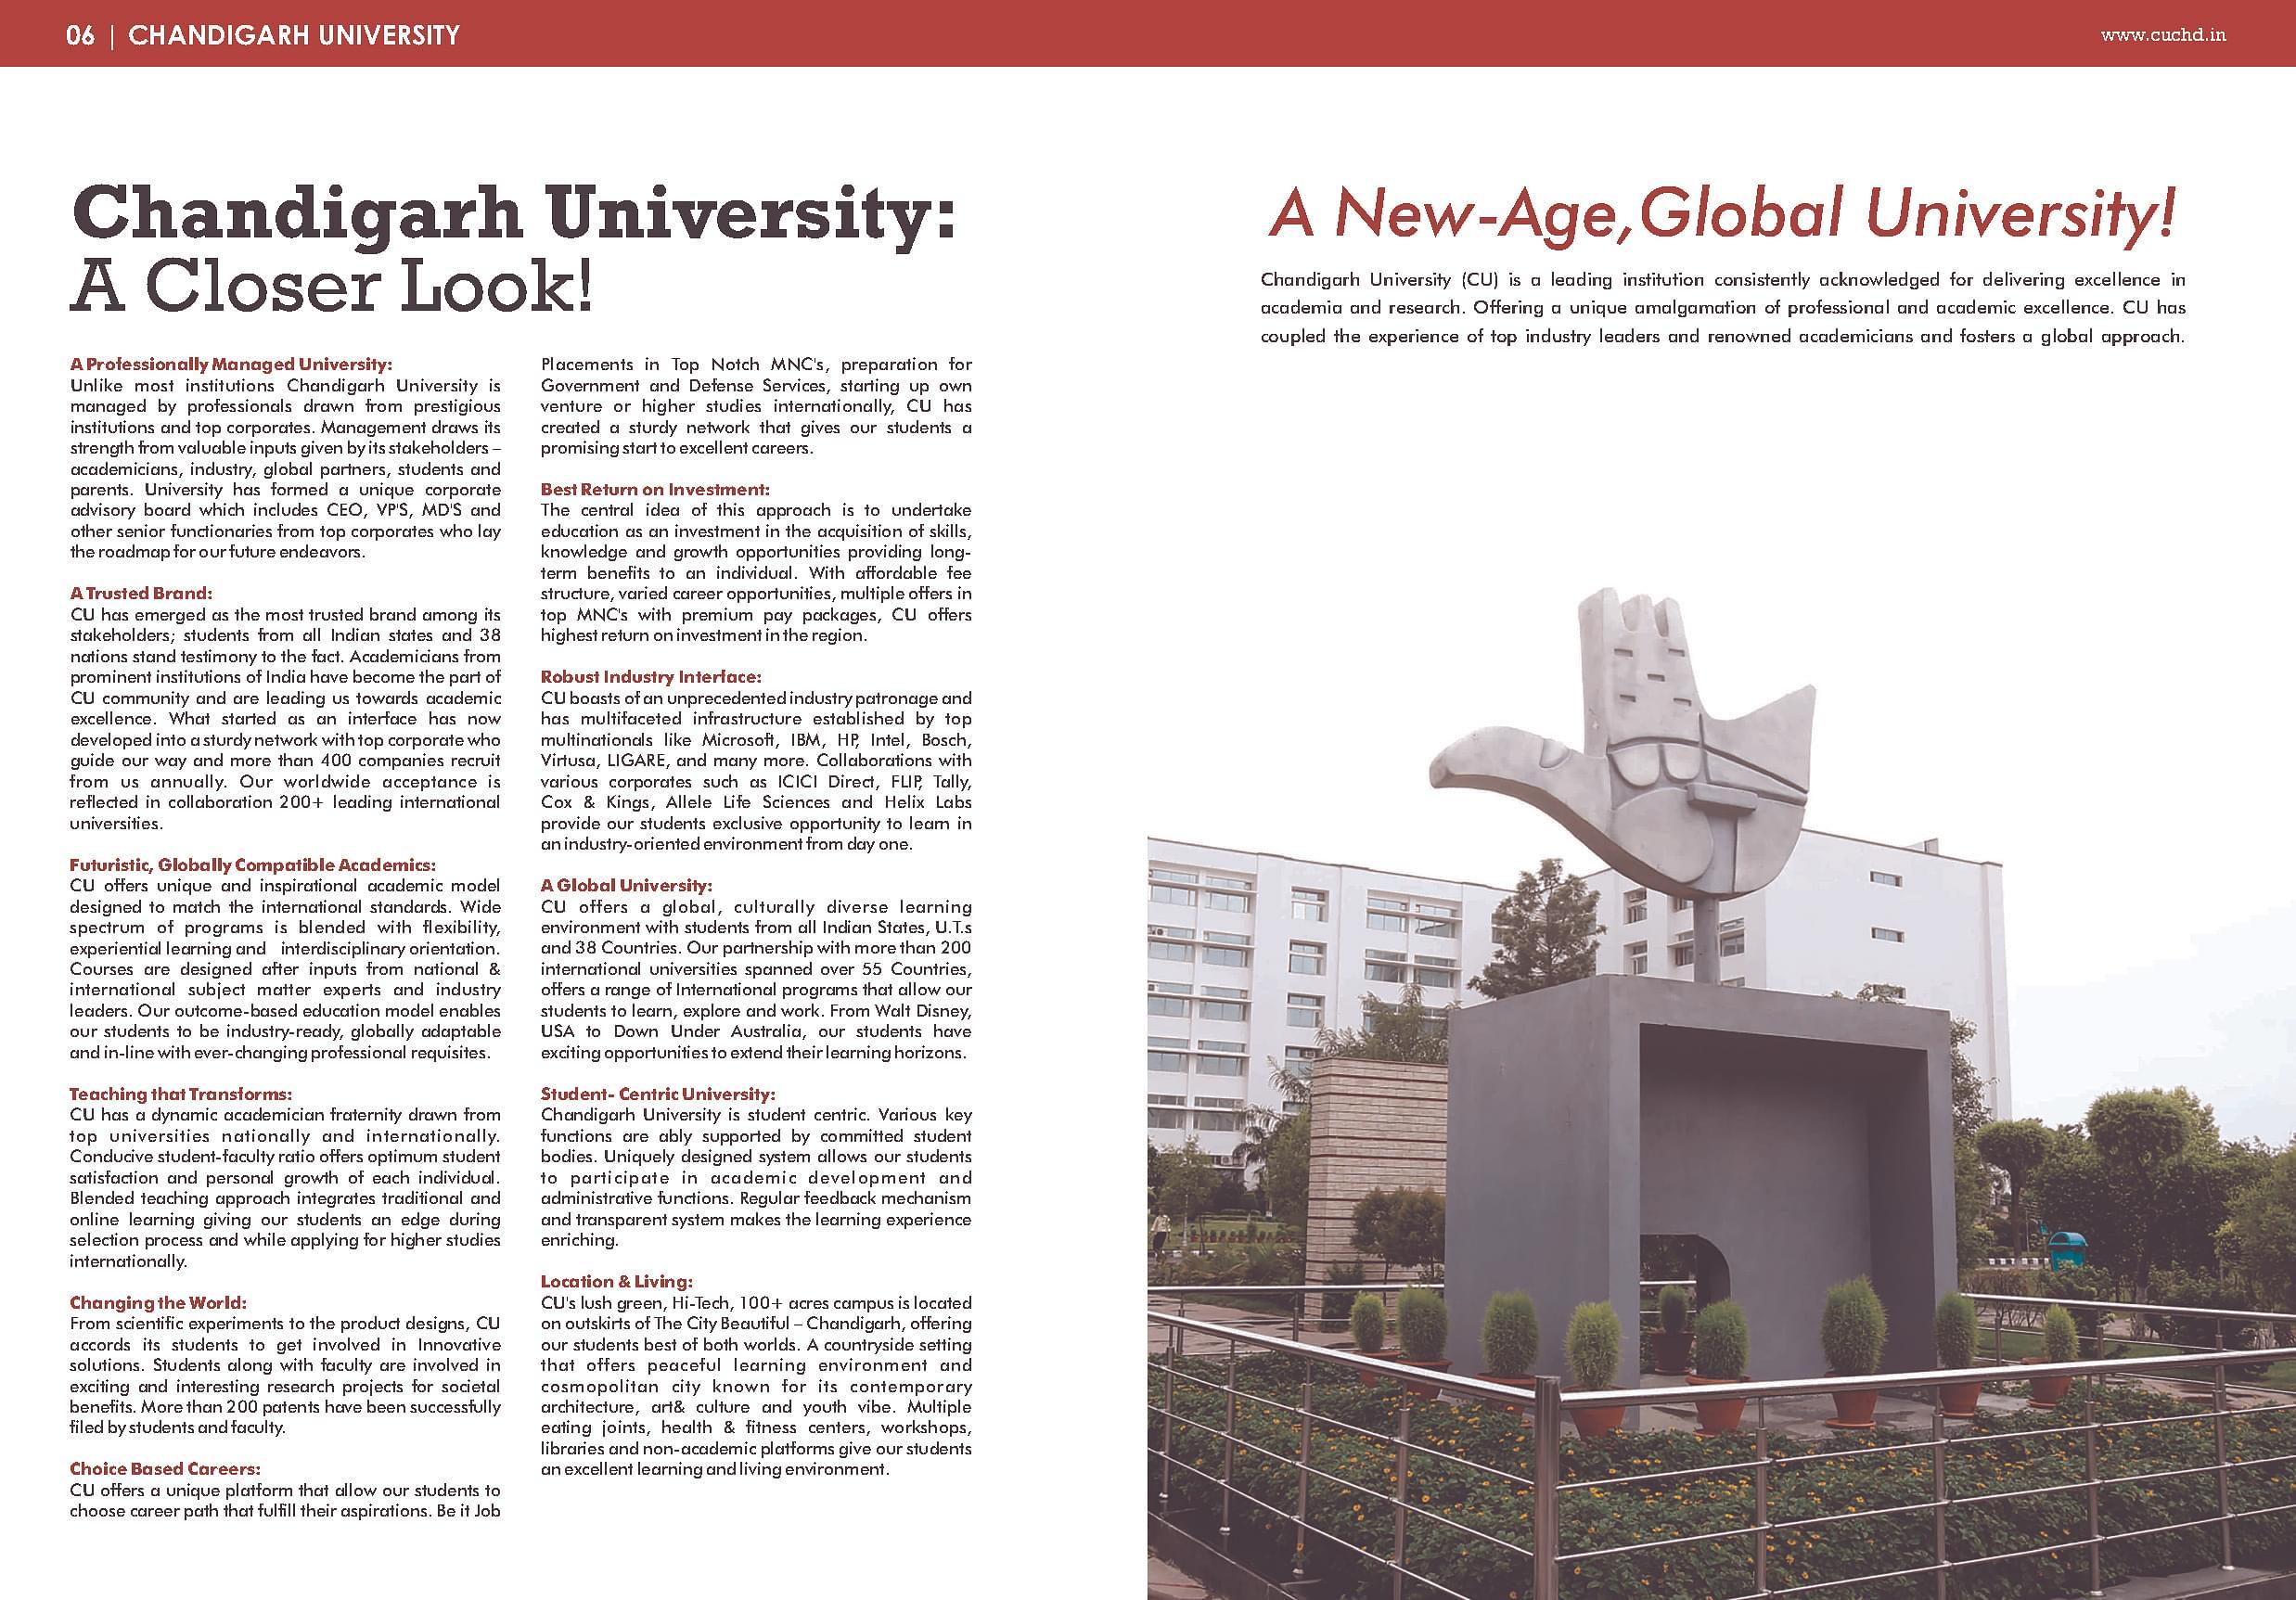 Chandigarh University (CU), Chandigarh - Admissions, Courses